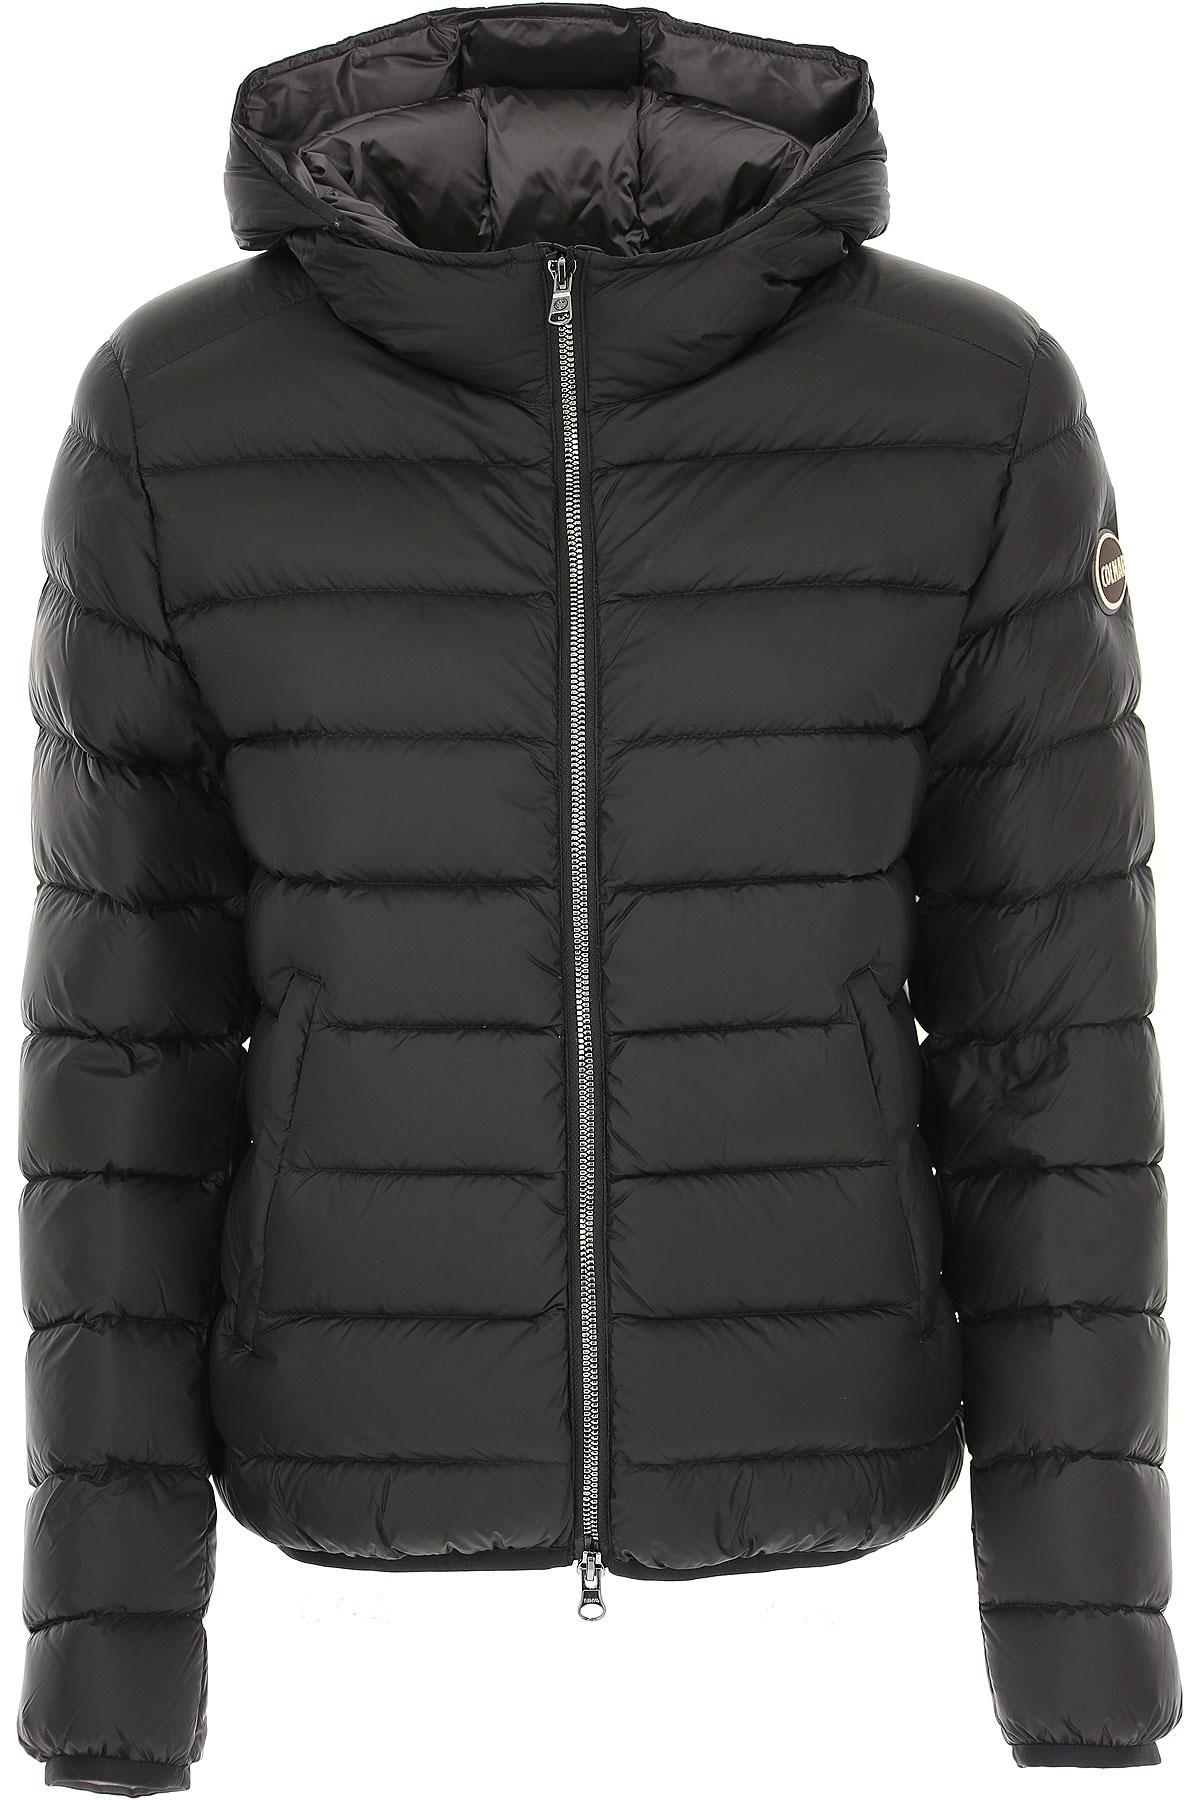 Colmar Down Jacket for Women, Puffer Ski Jacket On Sale, Black, Down, 2019, 2 4